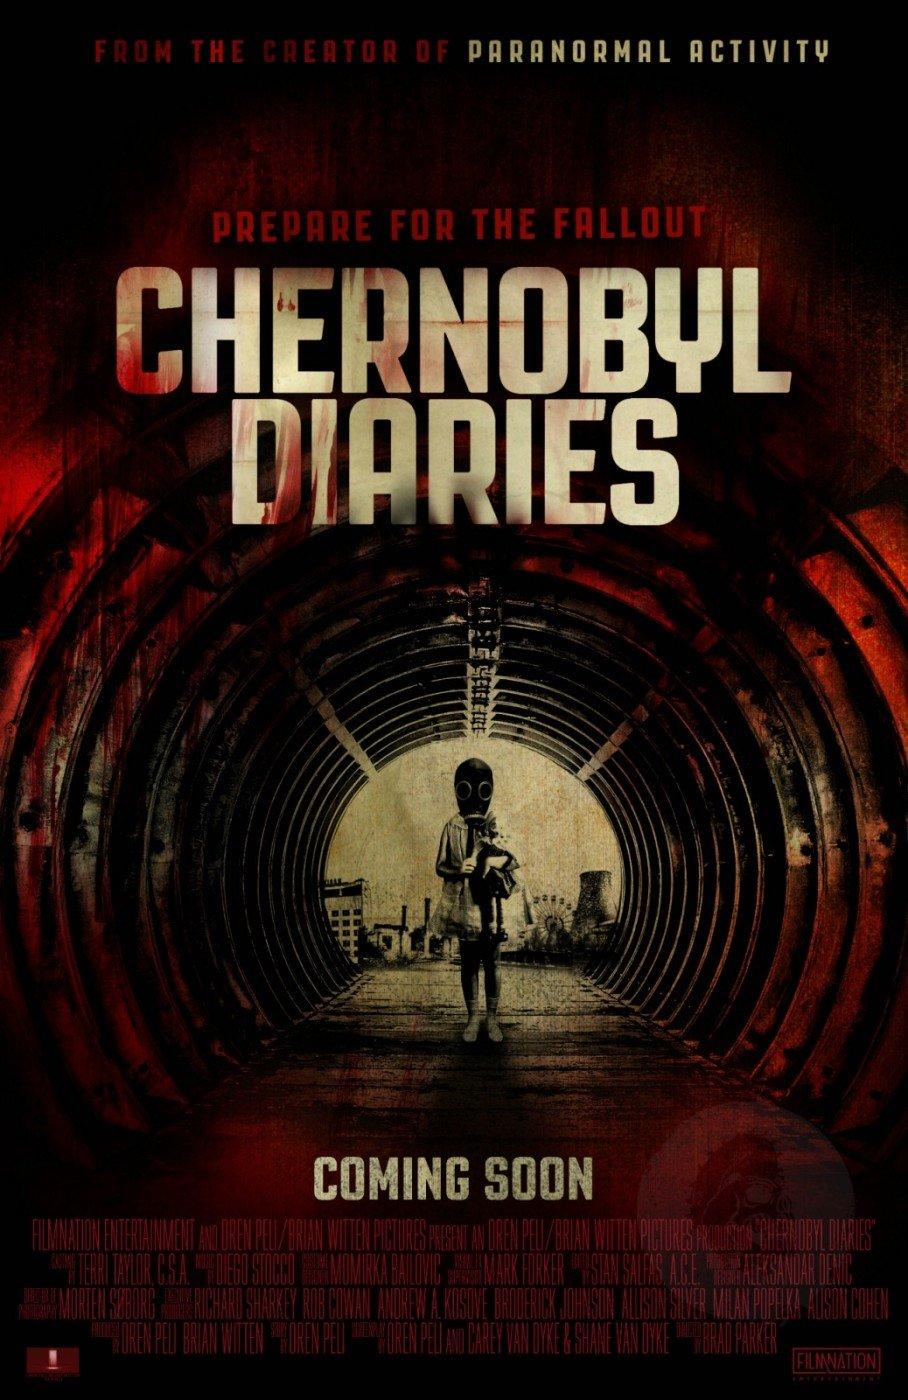 ¿Qué última PELÍCULA habéis/has visto? [2] - Página 49 Chernobyl-Diaries-19-findelahistoira.com_